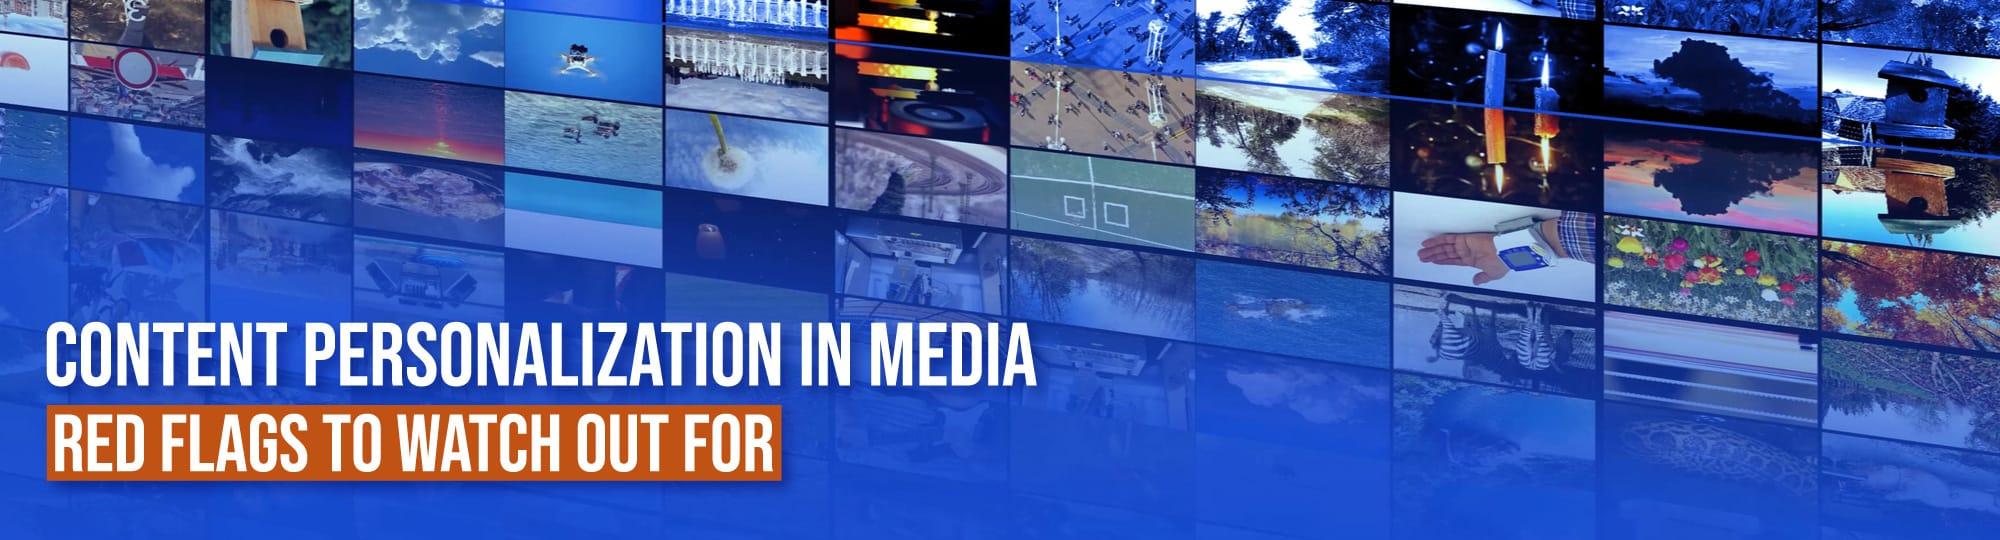 Content Personalization in Media